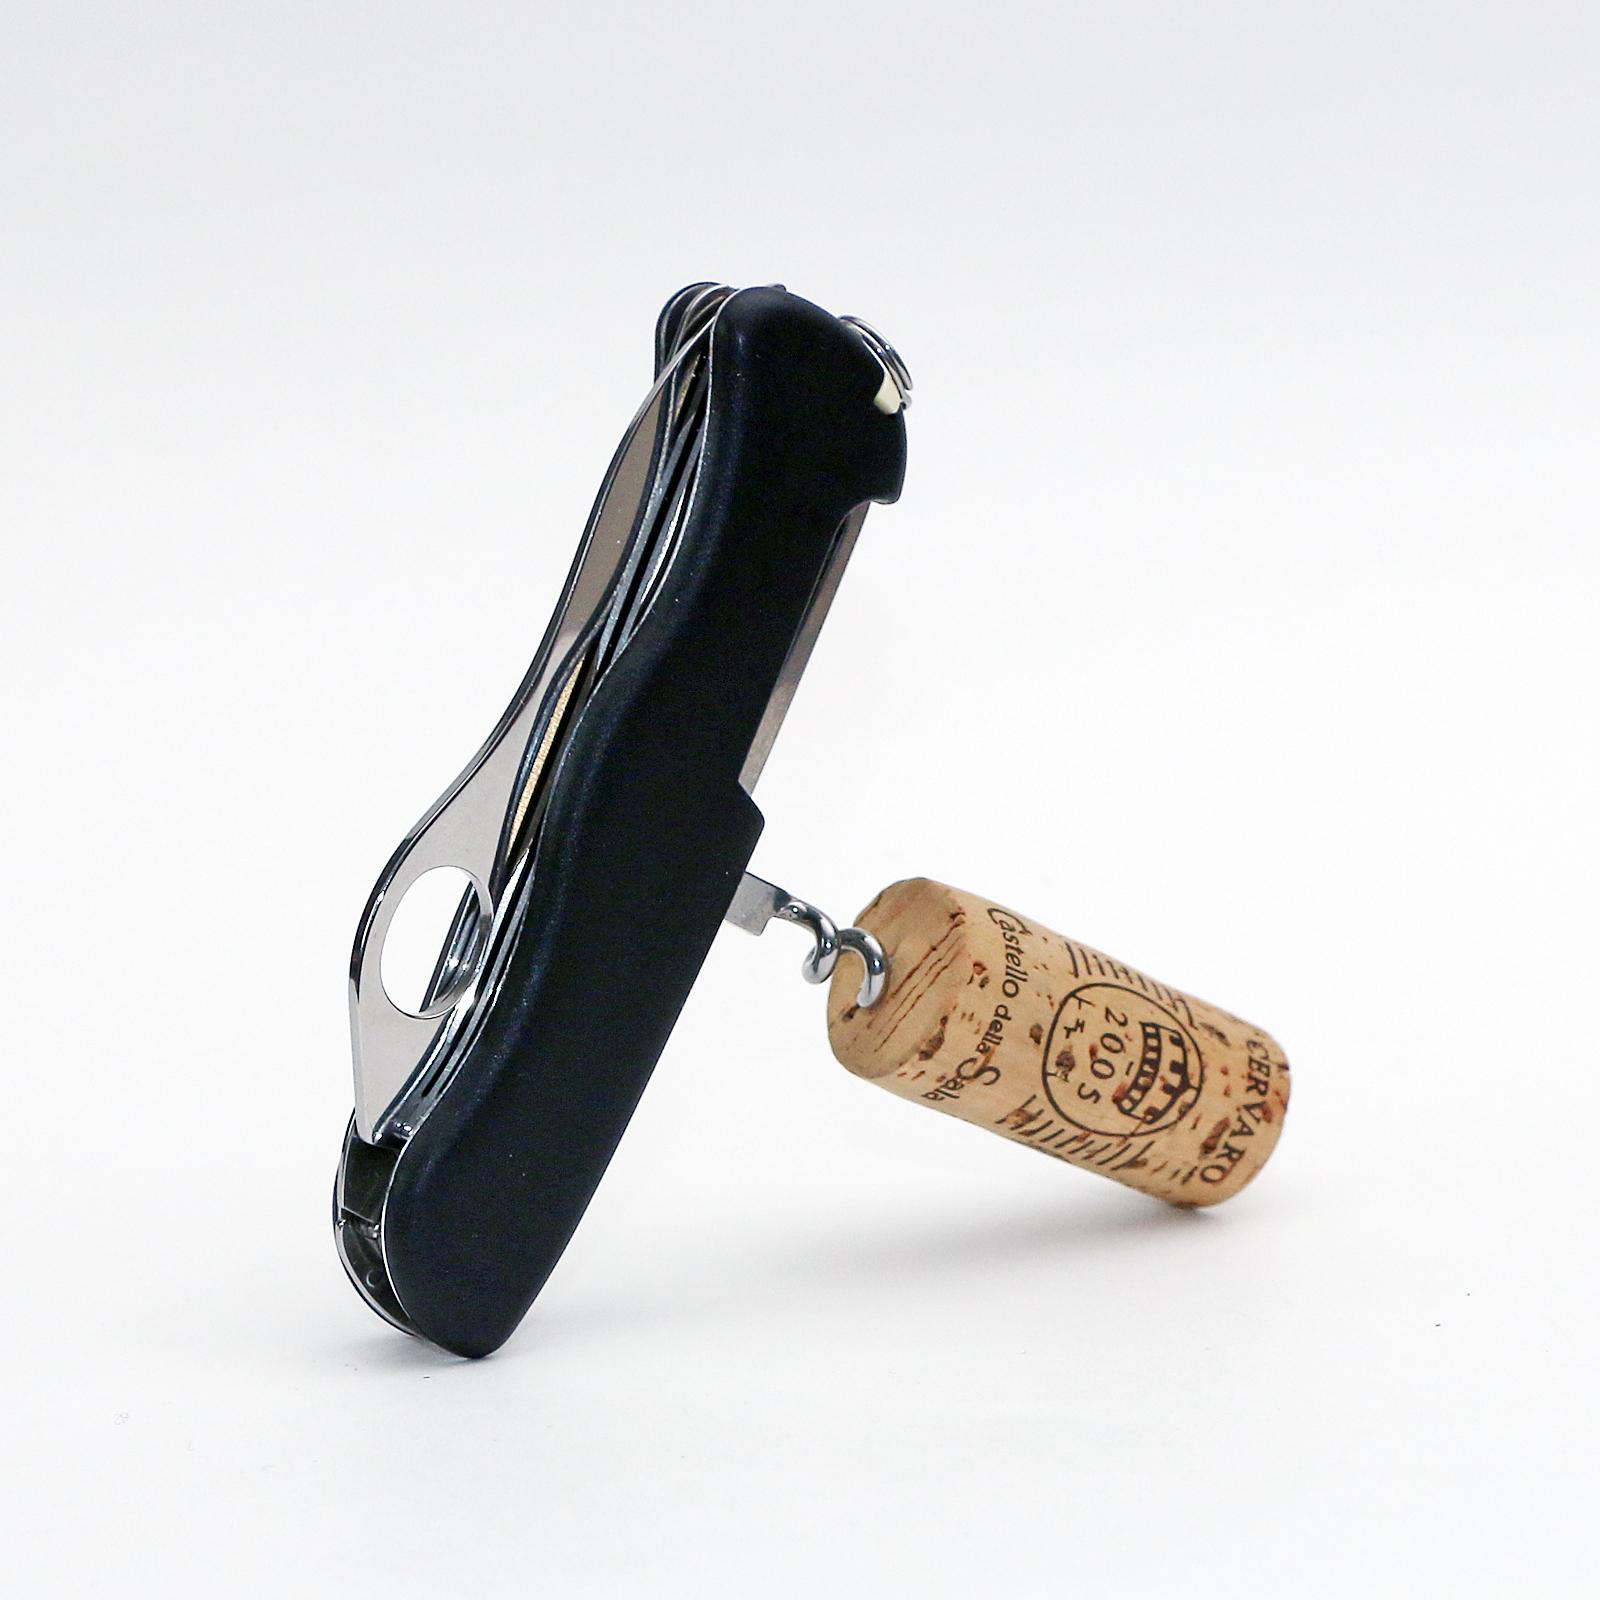 Forester One Hand Black Victorinox (0.8363.MW3)